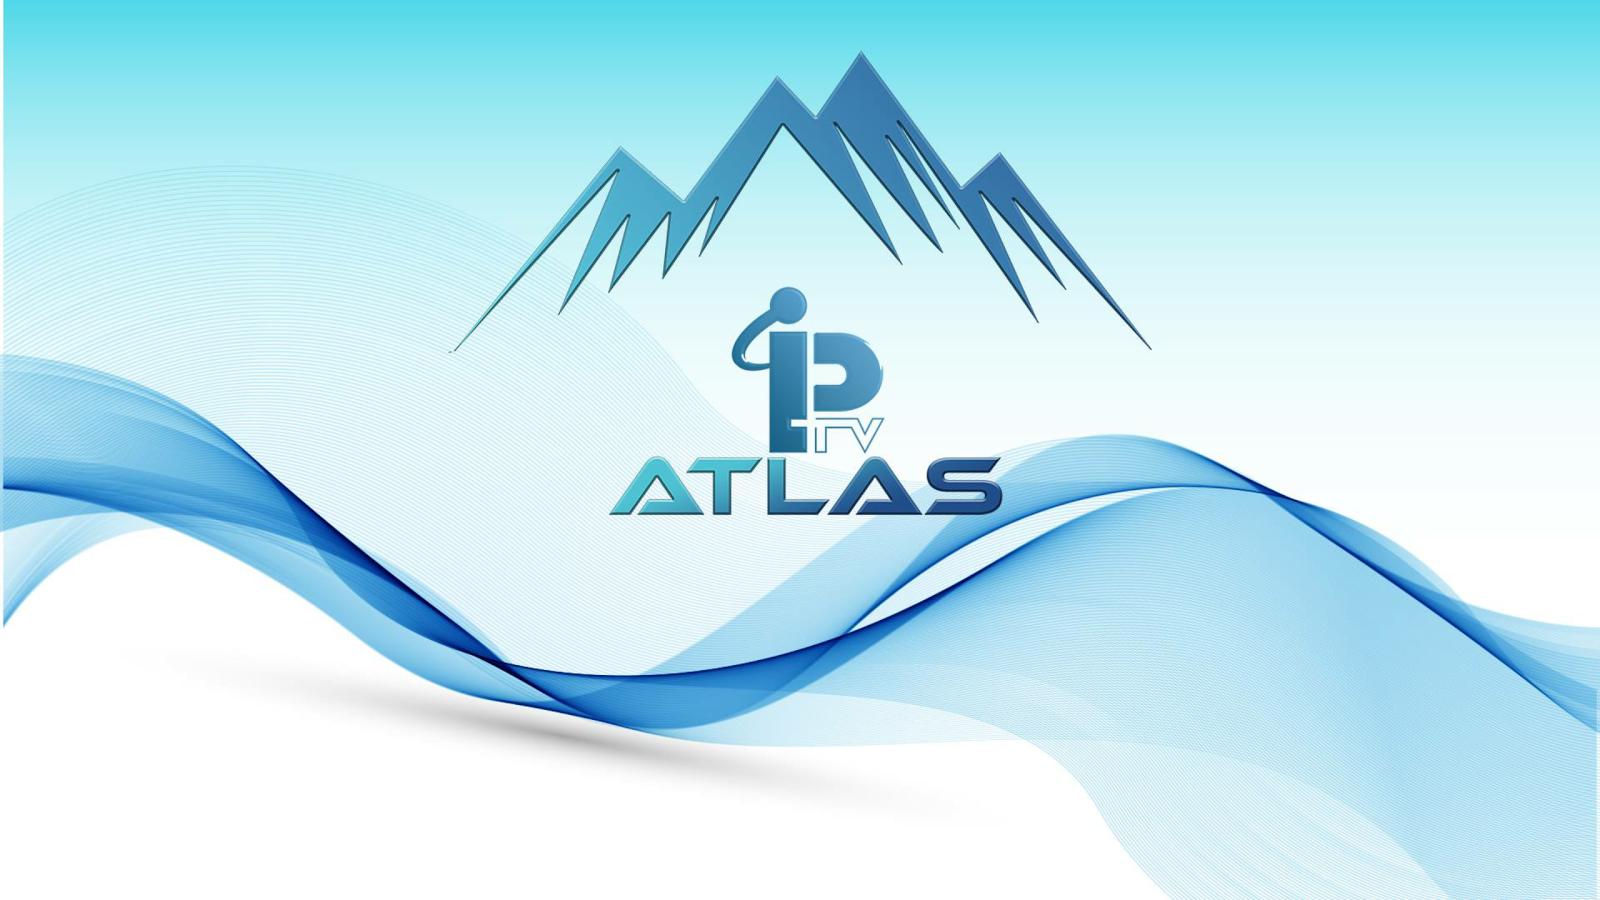 Atlas Iptv Premium APK Cracked Free Download | Cracked Android Apps